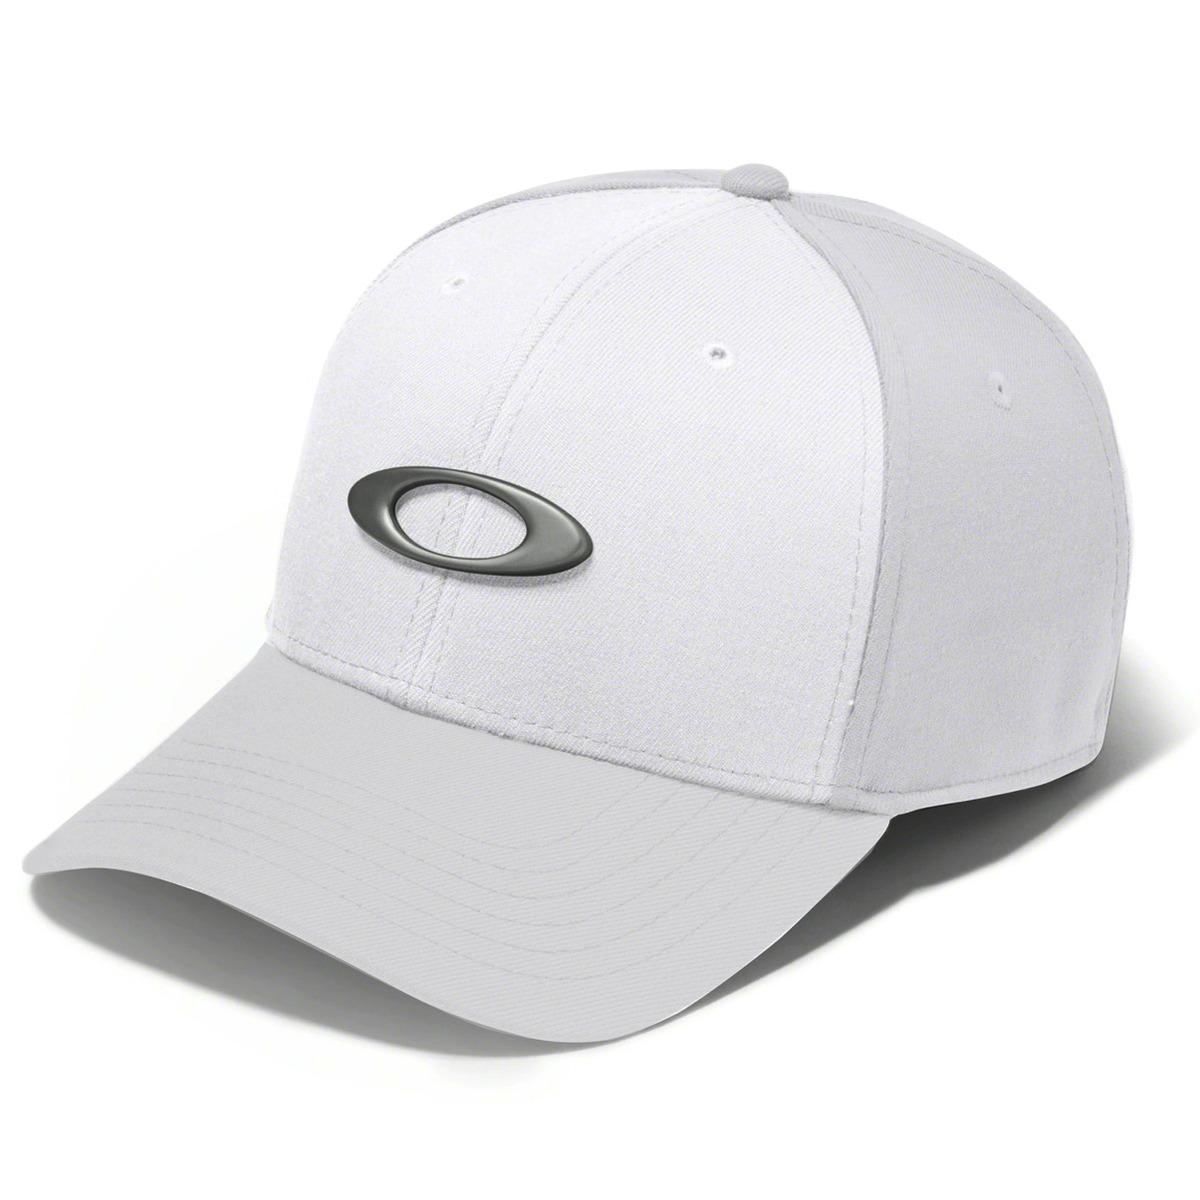 c05de3278a4be boné oakley tincan cap cinza com branco. Carregando zoom.